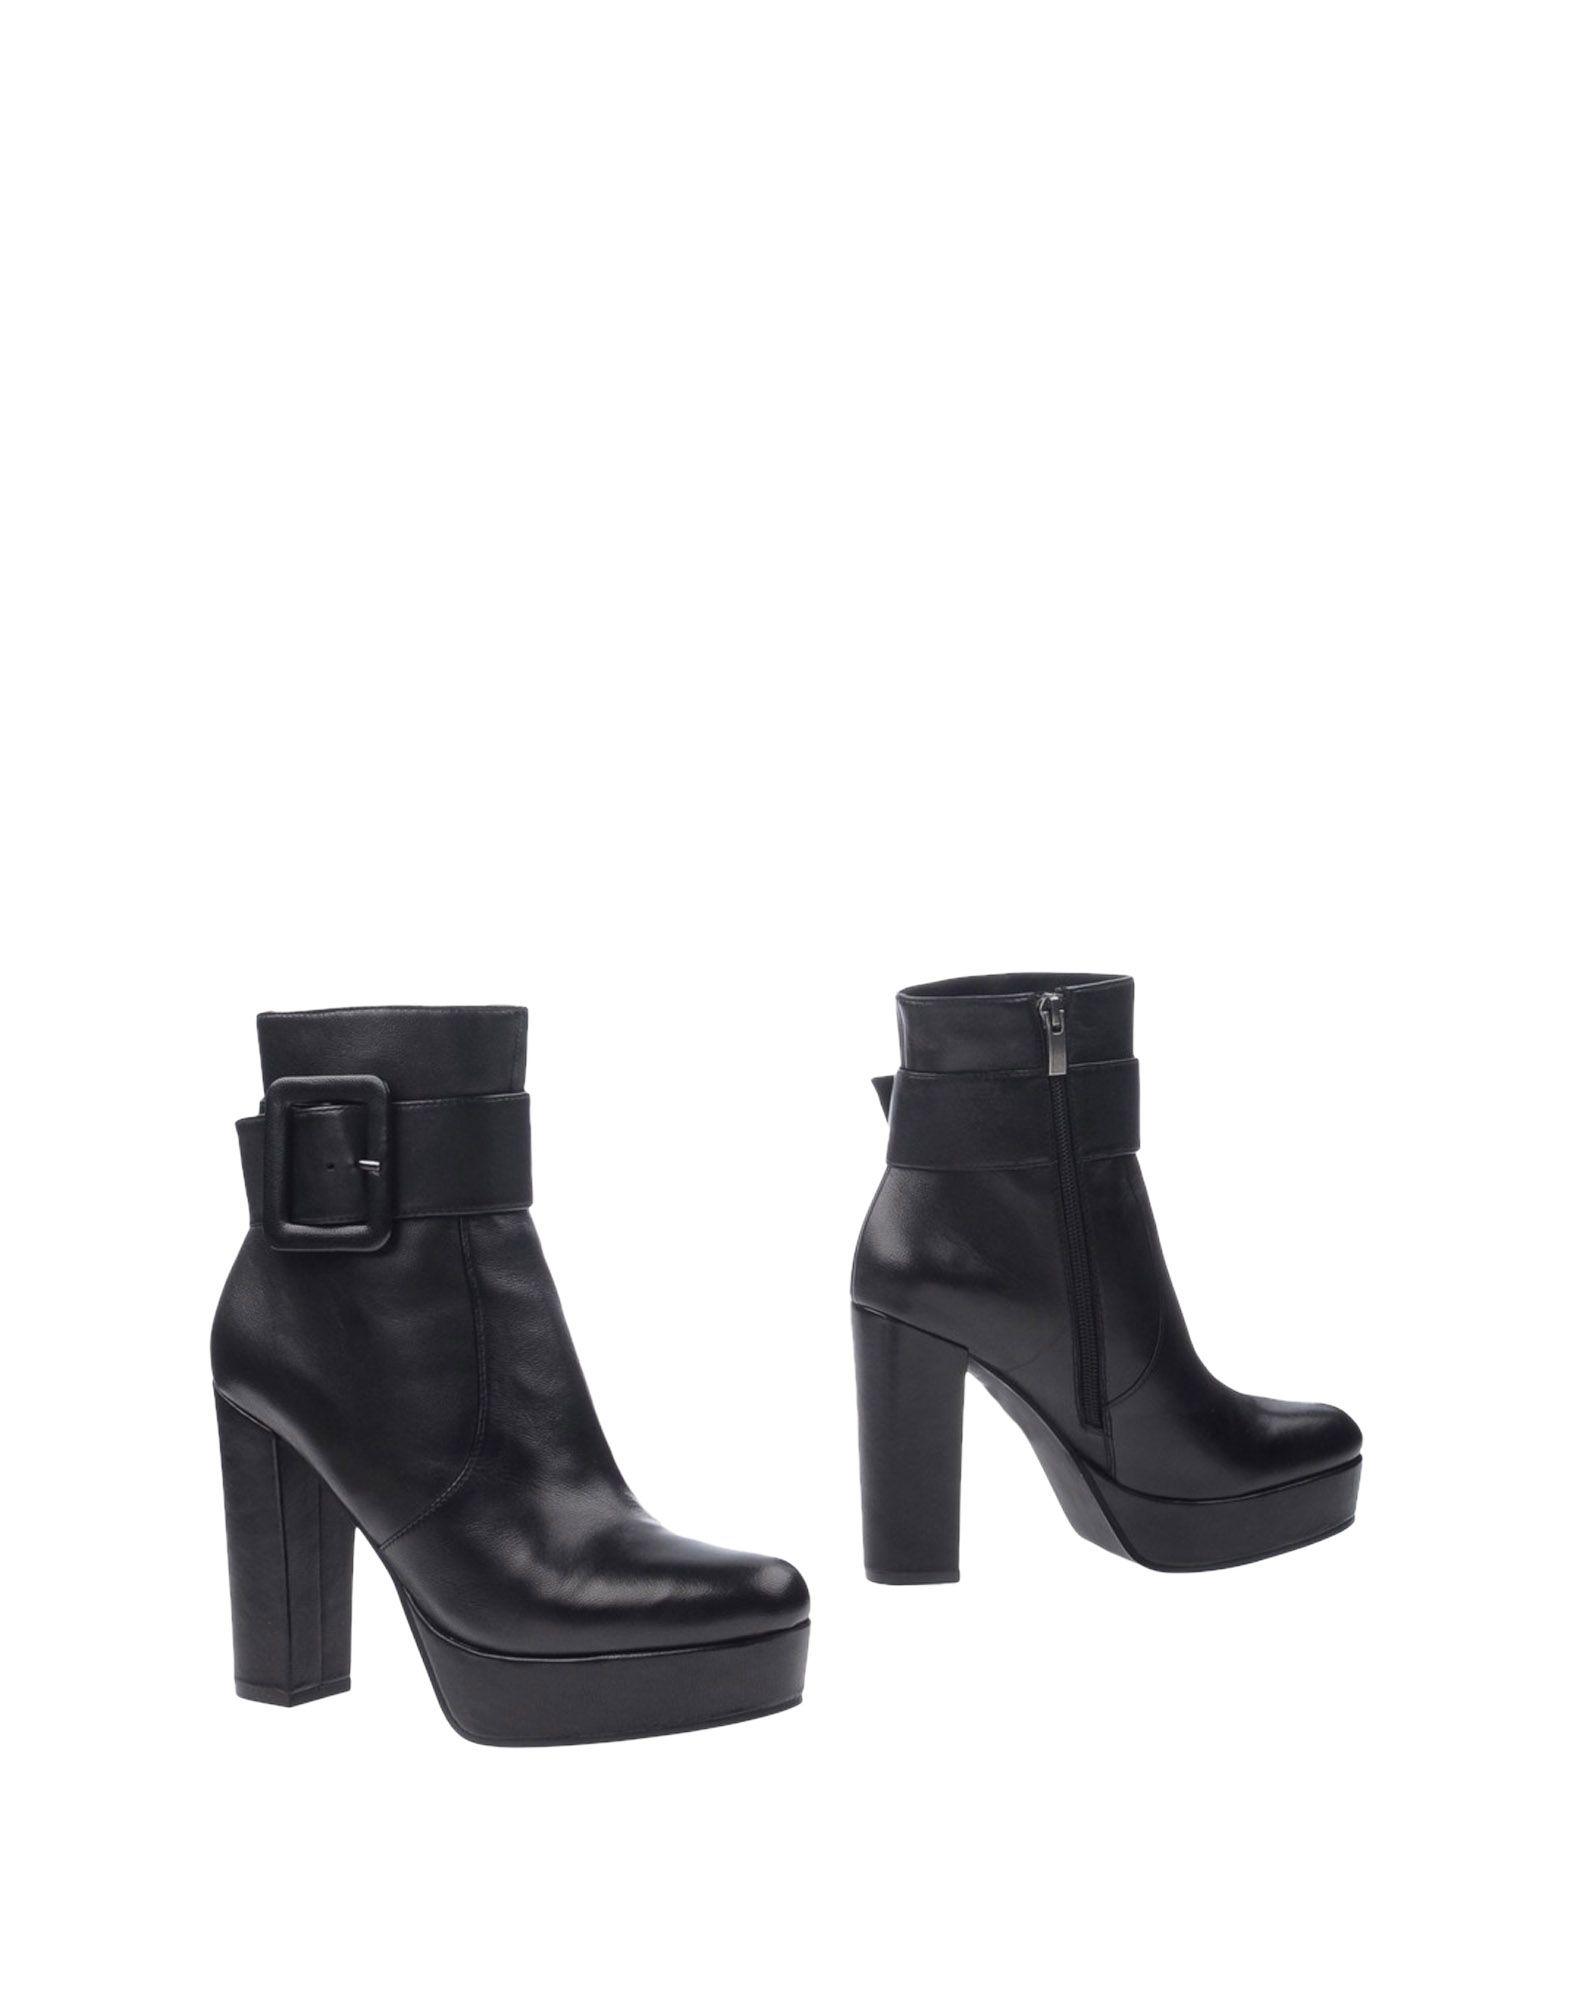 Bruno Premi Gute Stiefelette Damen  11308546IX Gute Premi Qualität beliebte Schuhe 55538e